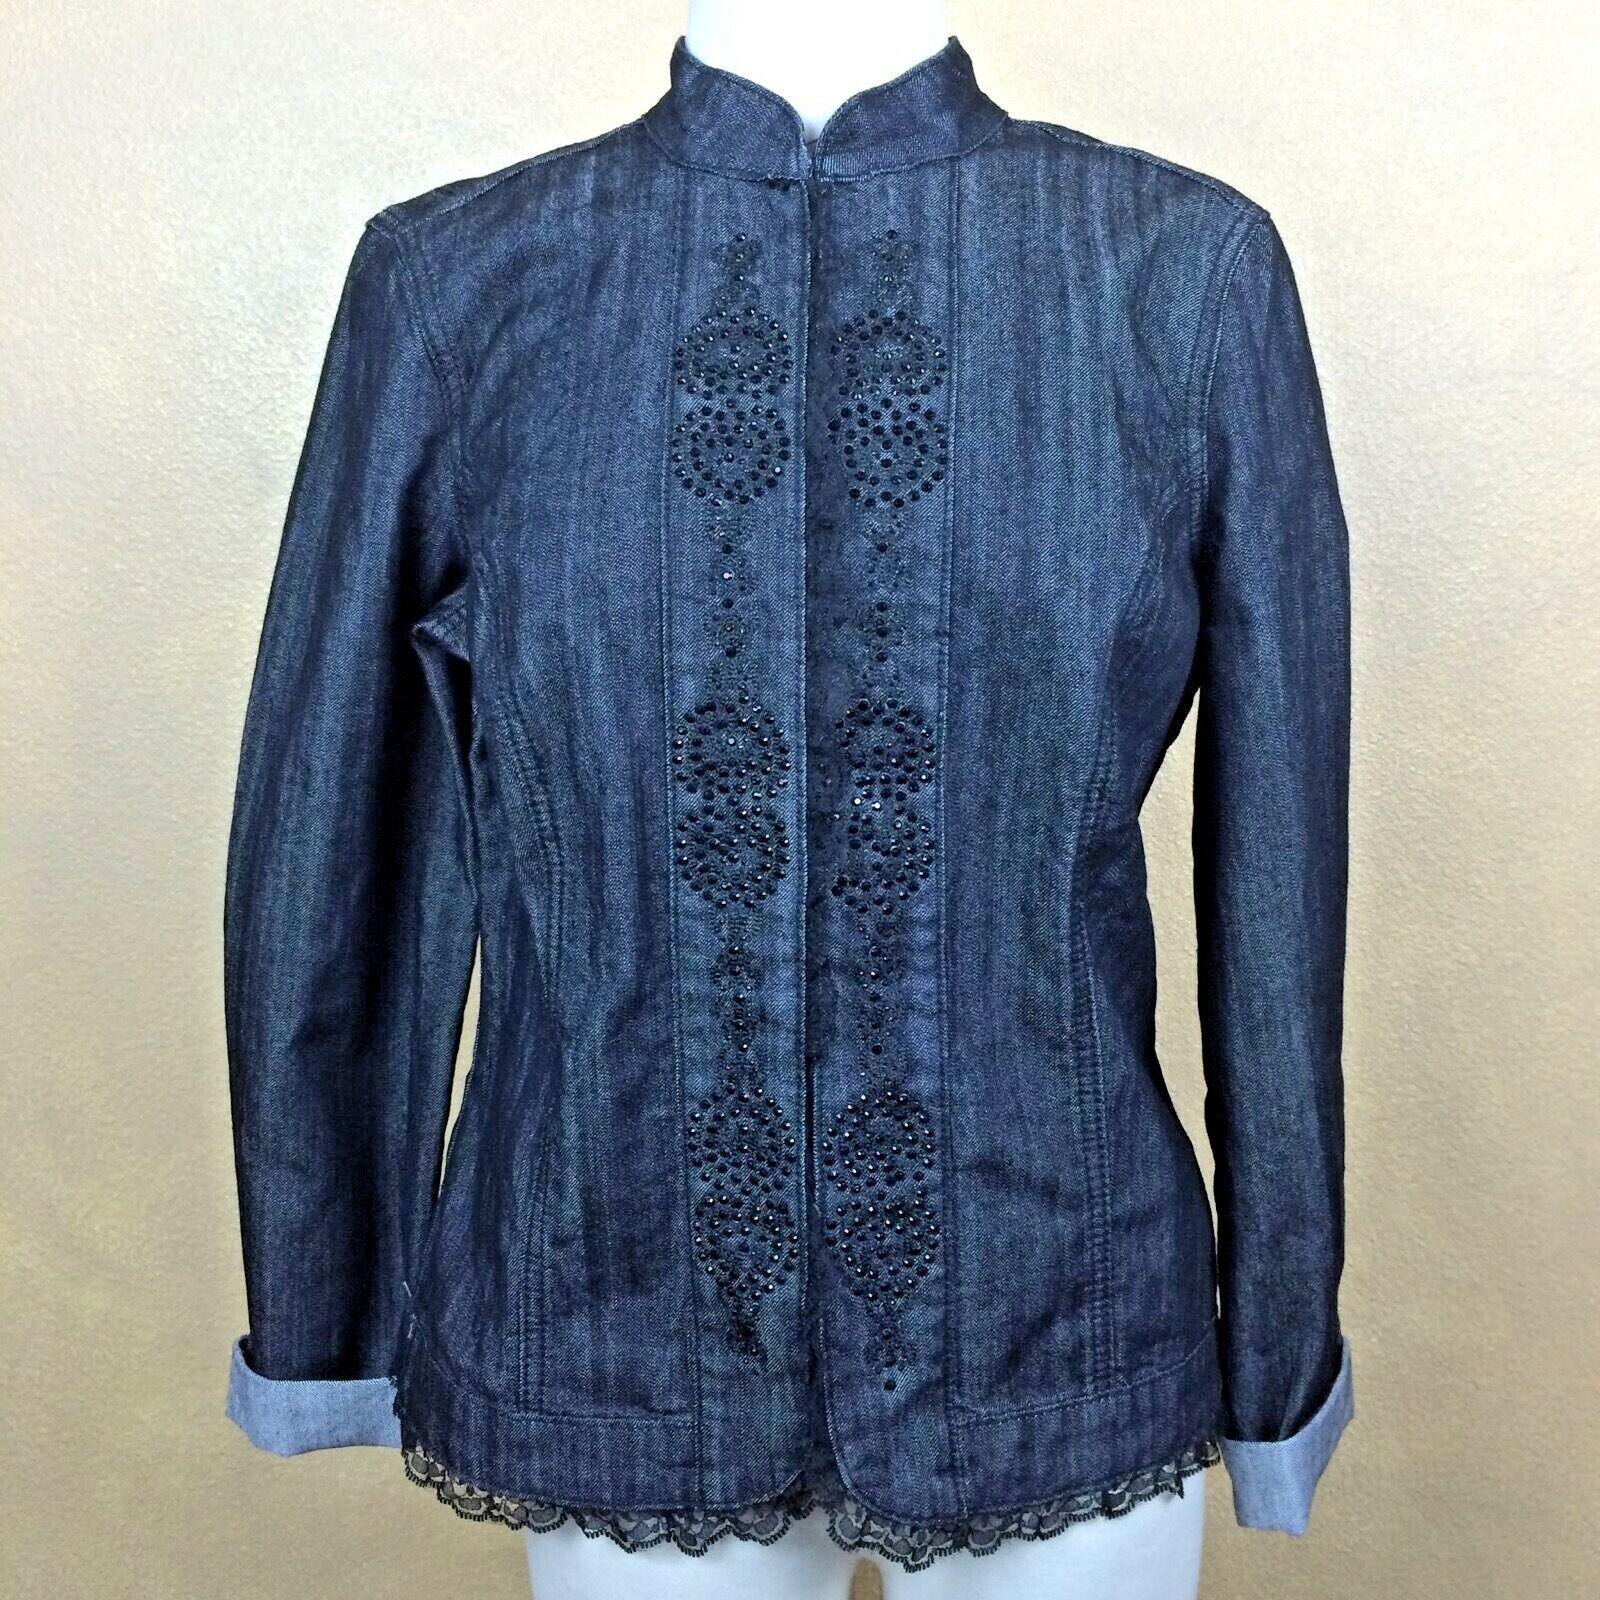 Baccini Black Jean Jacket w Lace Black Rhinestones Cotton Blend Denim S